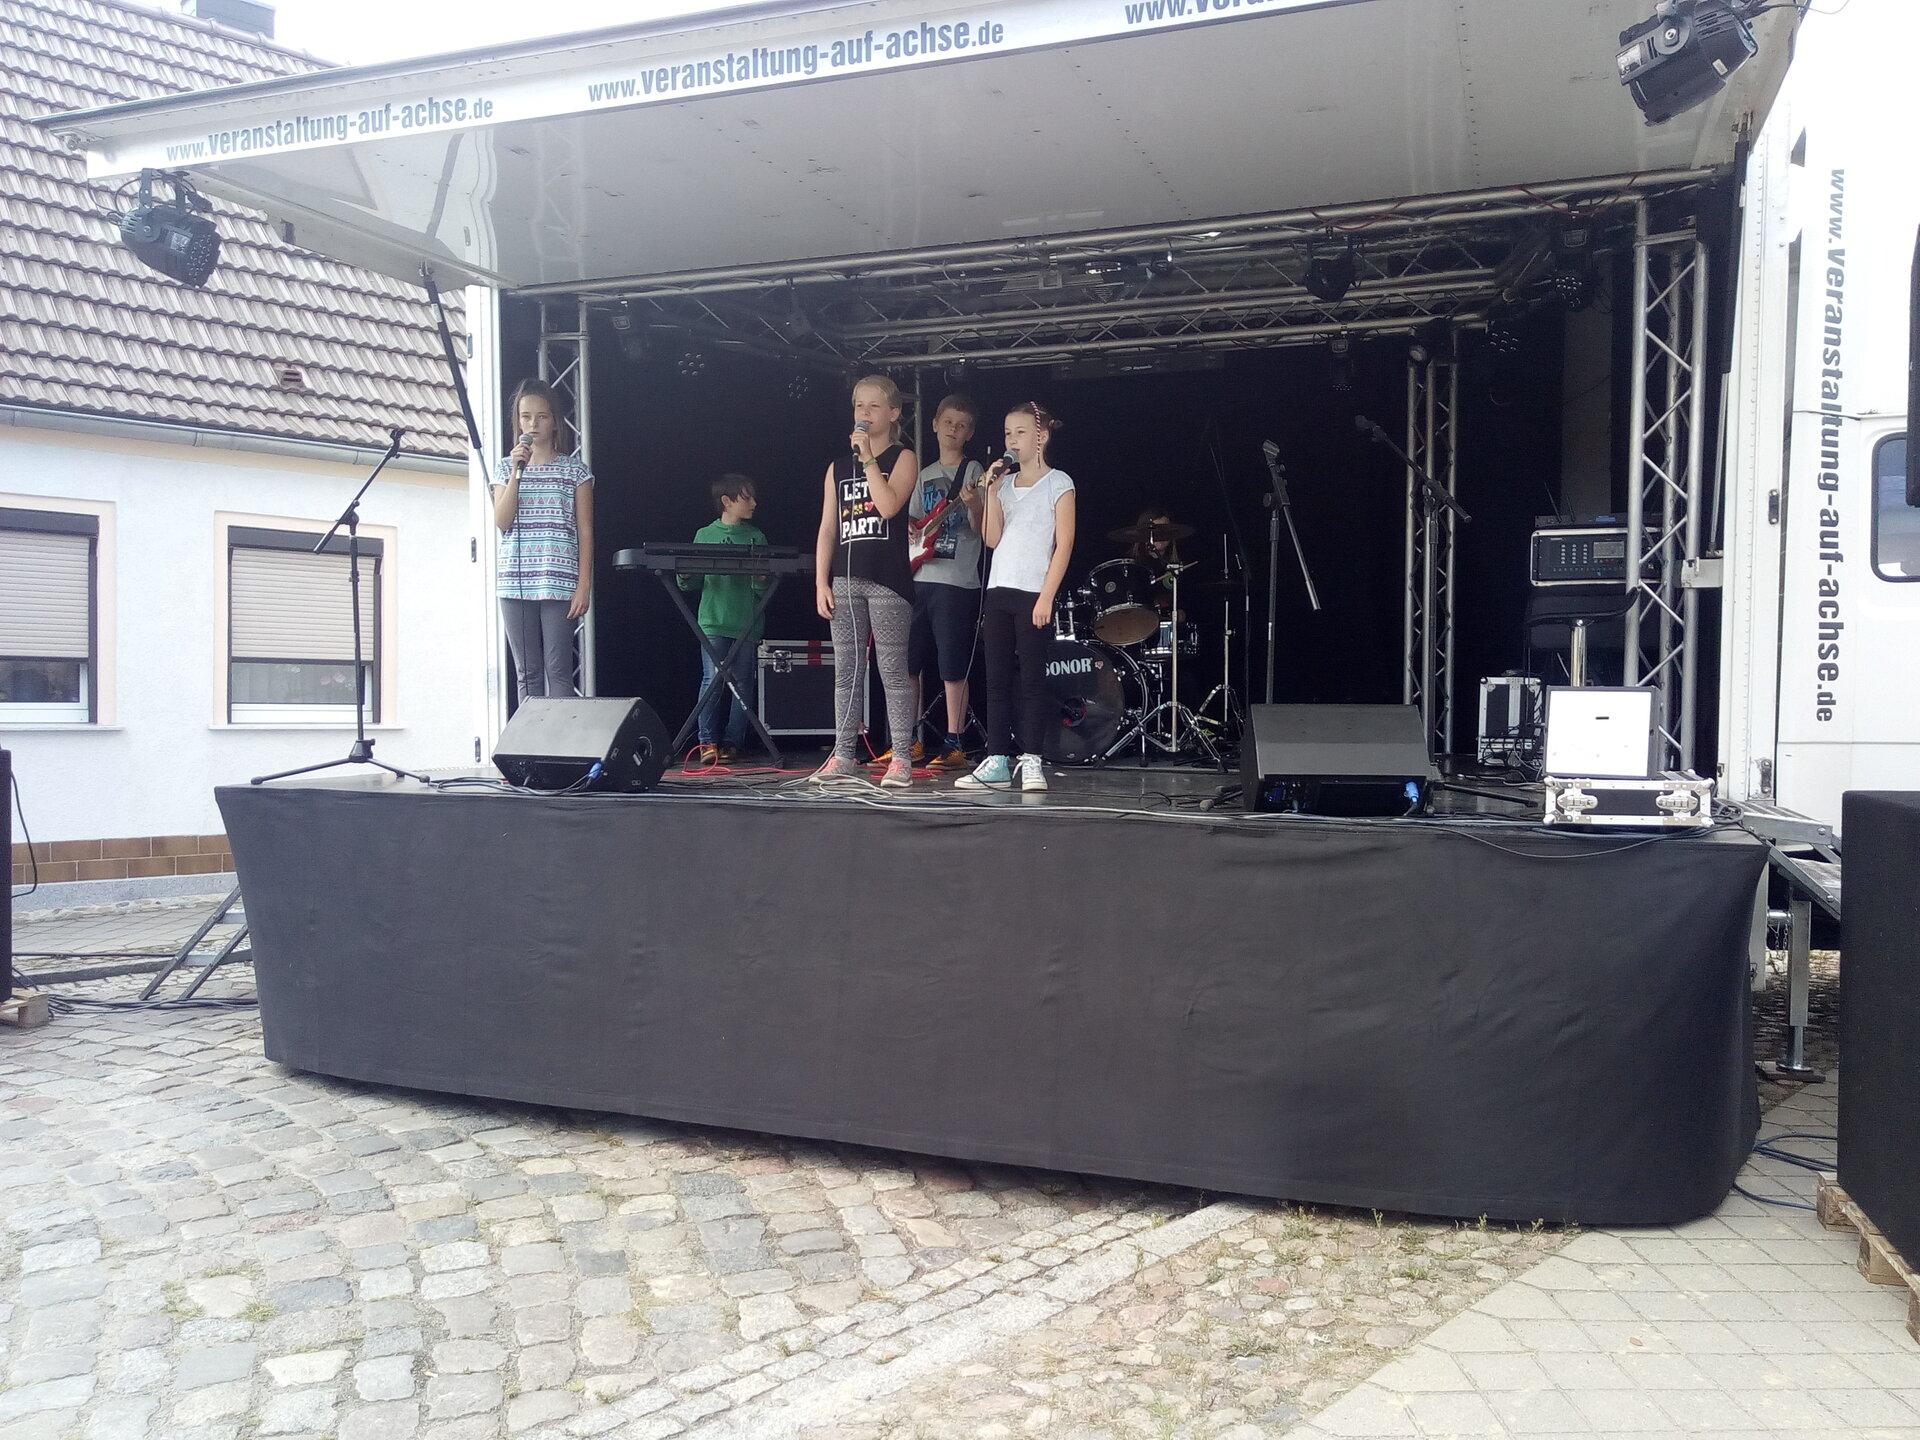 Stadtfest_Seelow_2017_2